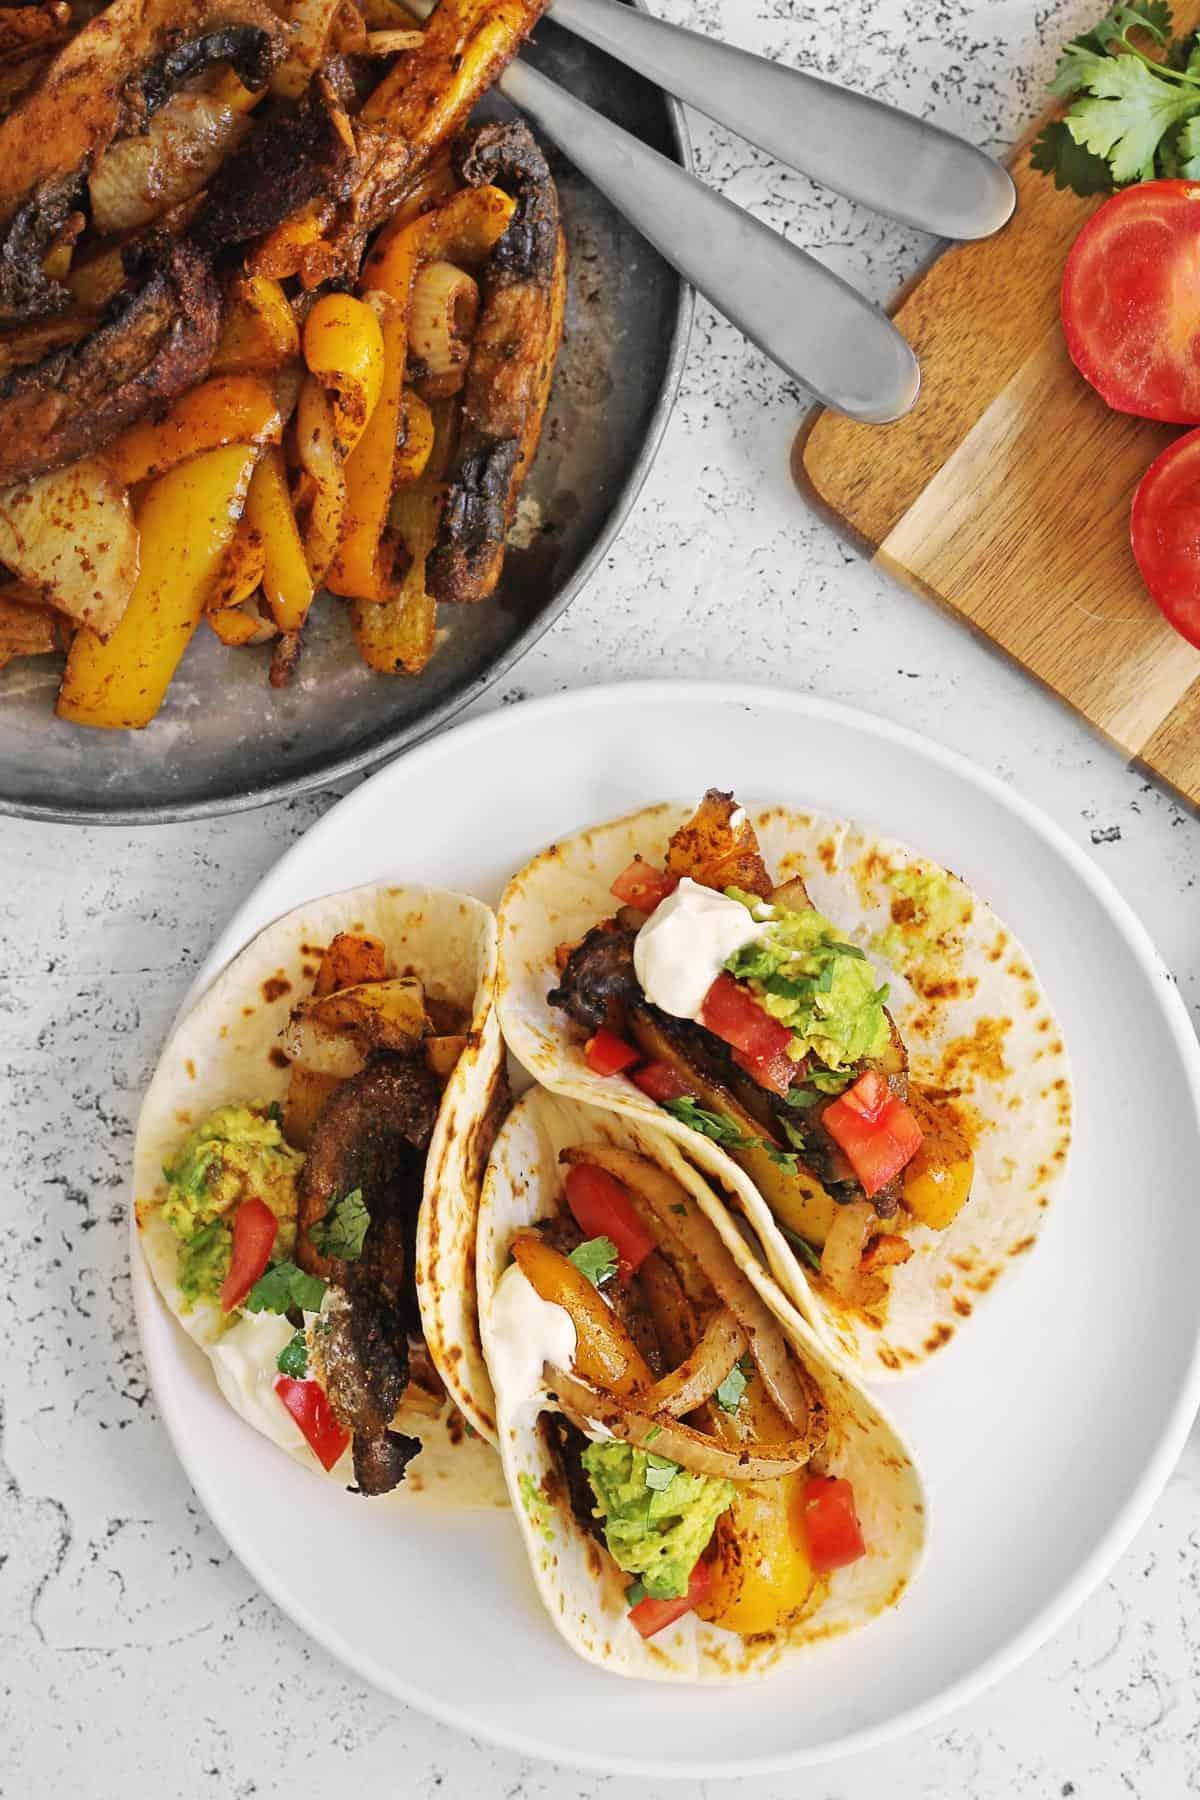 Vegan fajitas on a white plate